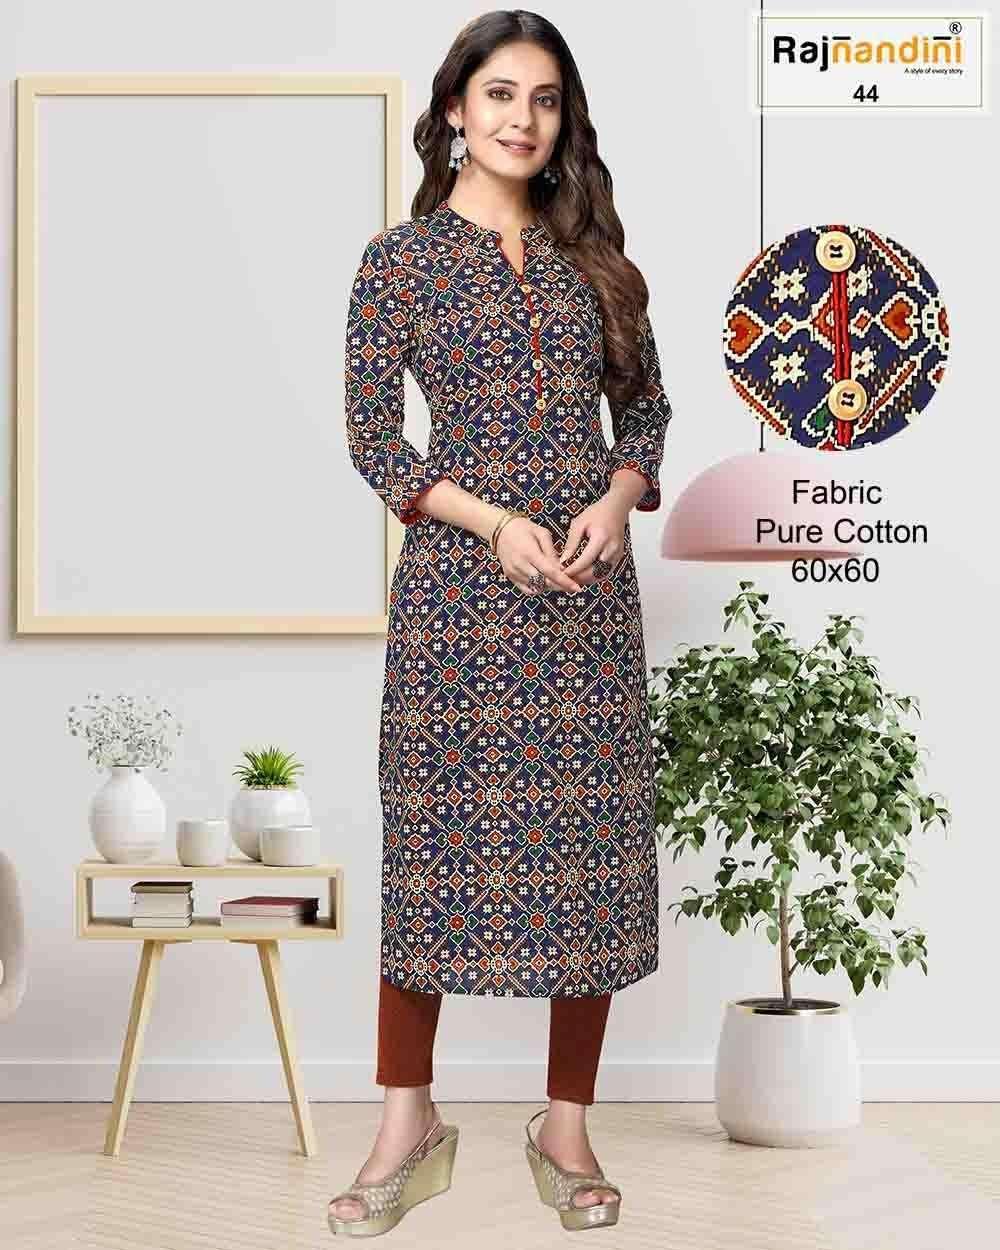 Rajnandini Vol A fancy Cotton Printed kurti Catalog Supplier in Surat